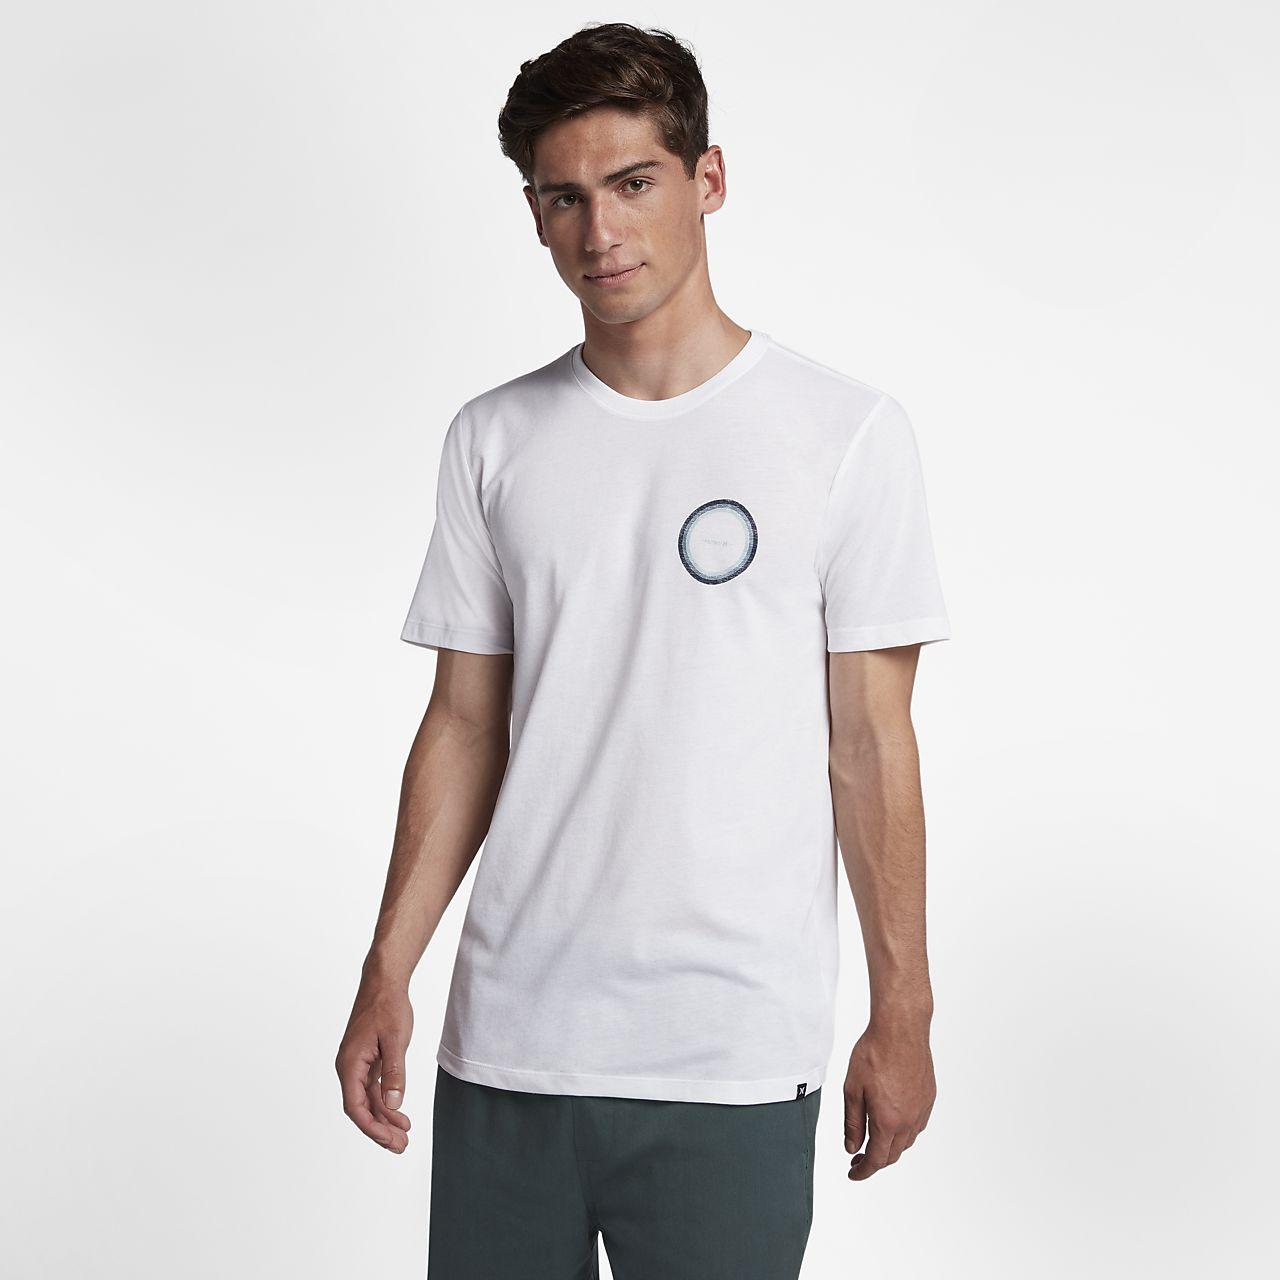 Hurley Dri-FIT Men's Cropped T-Shirt